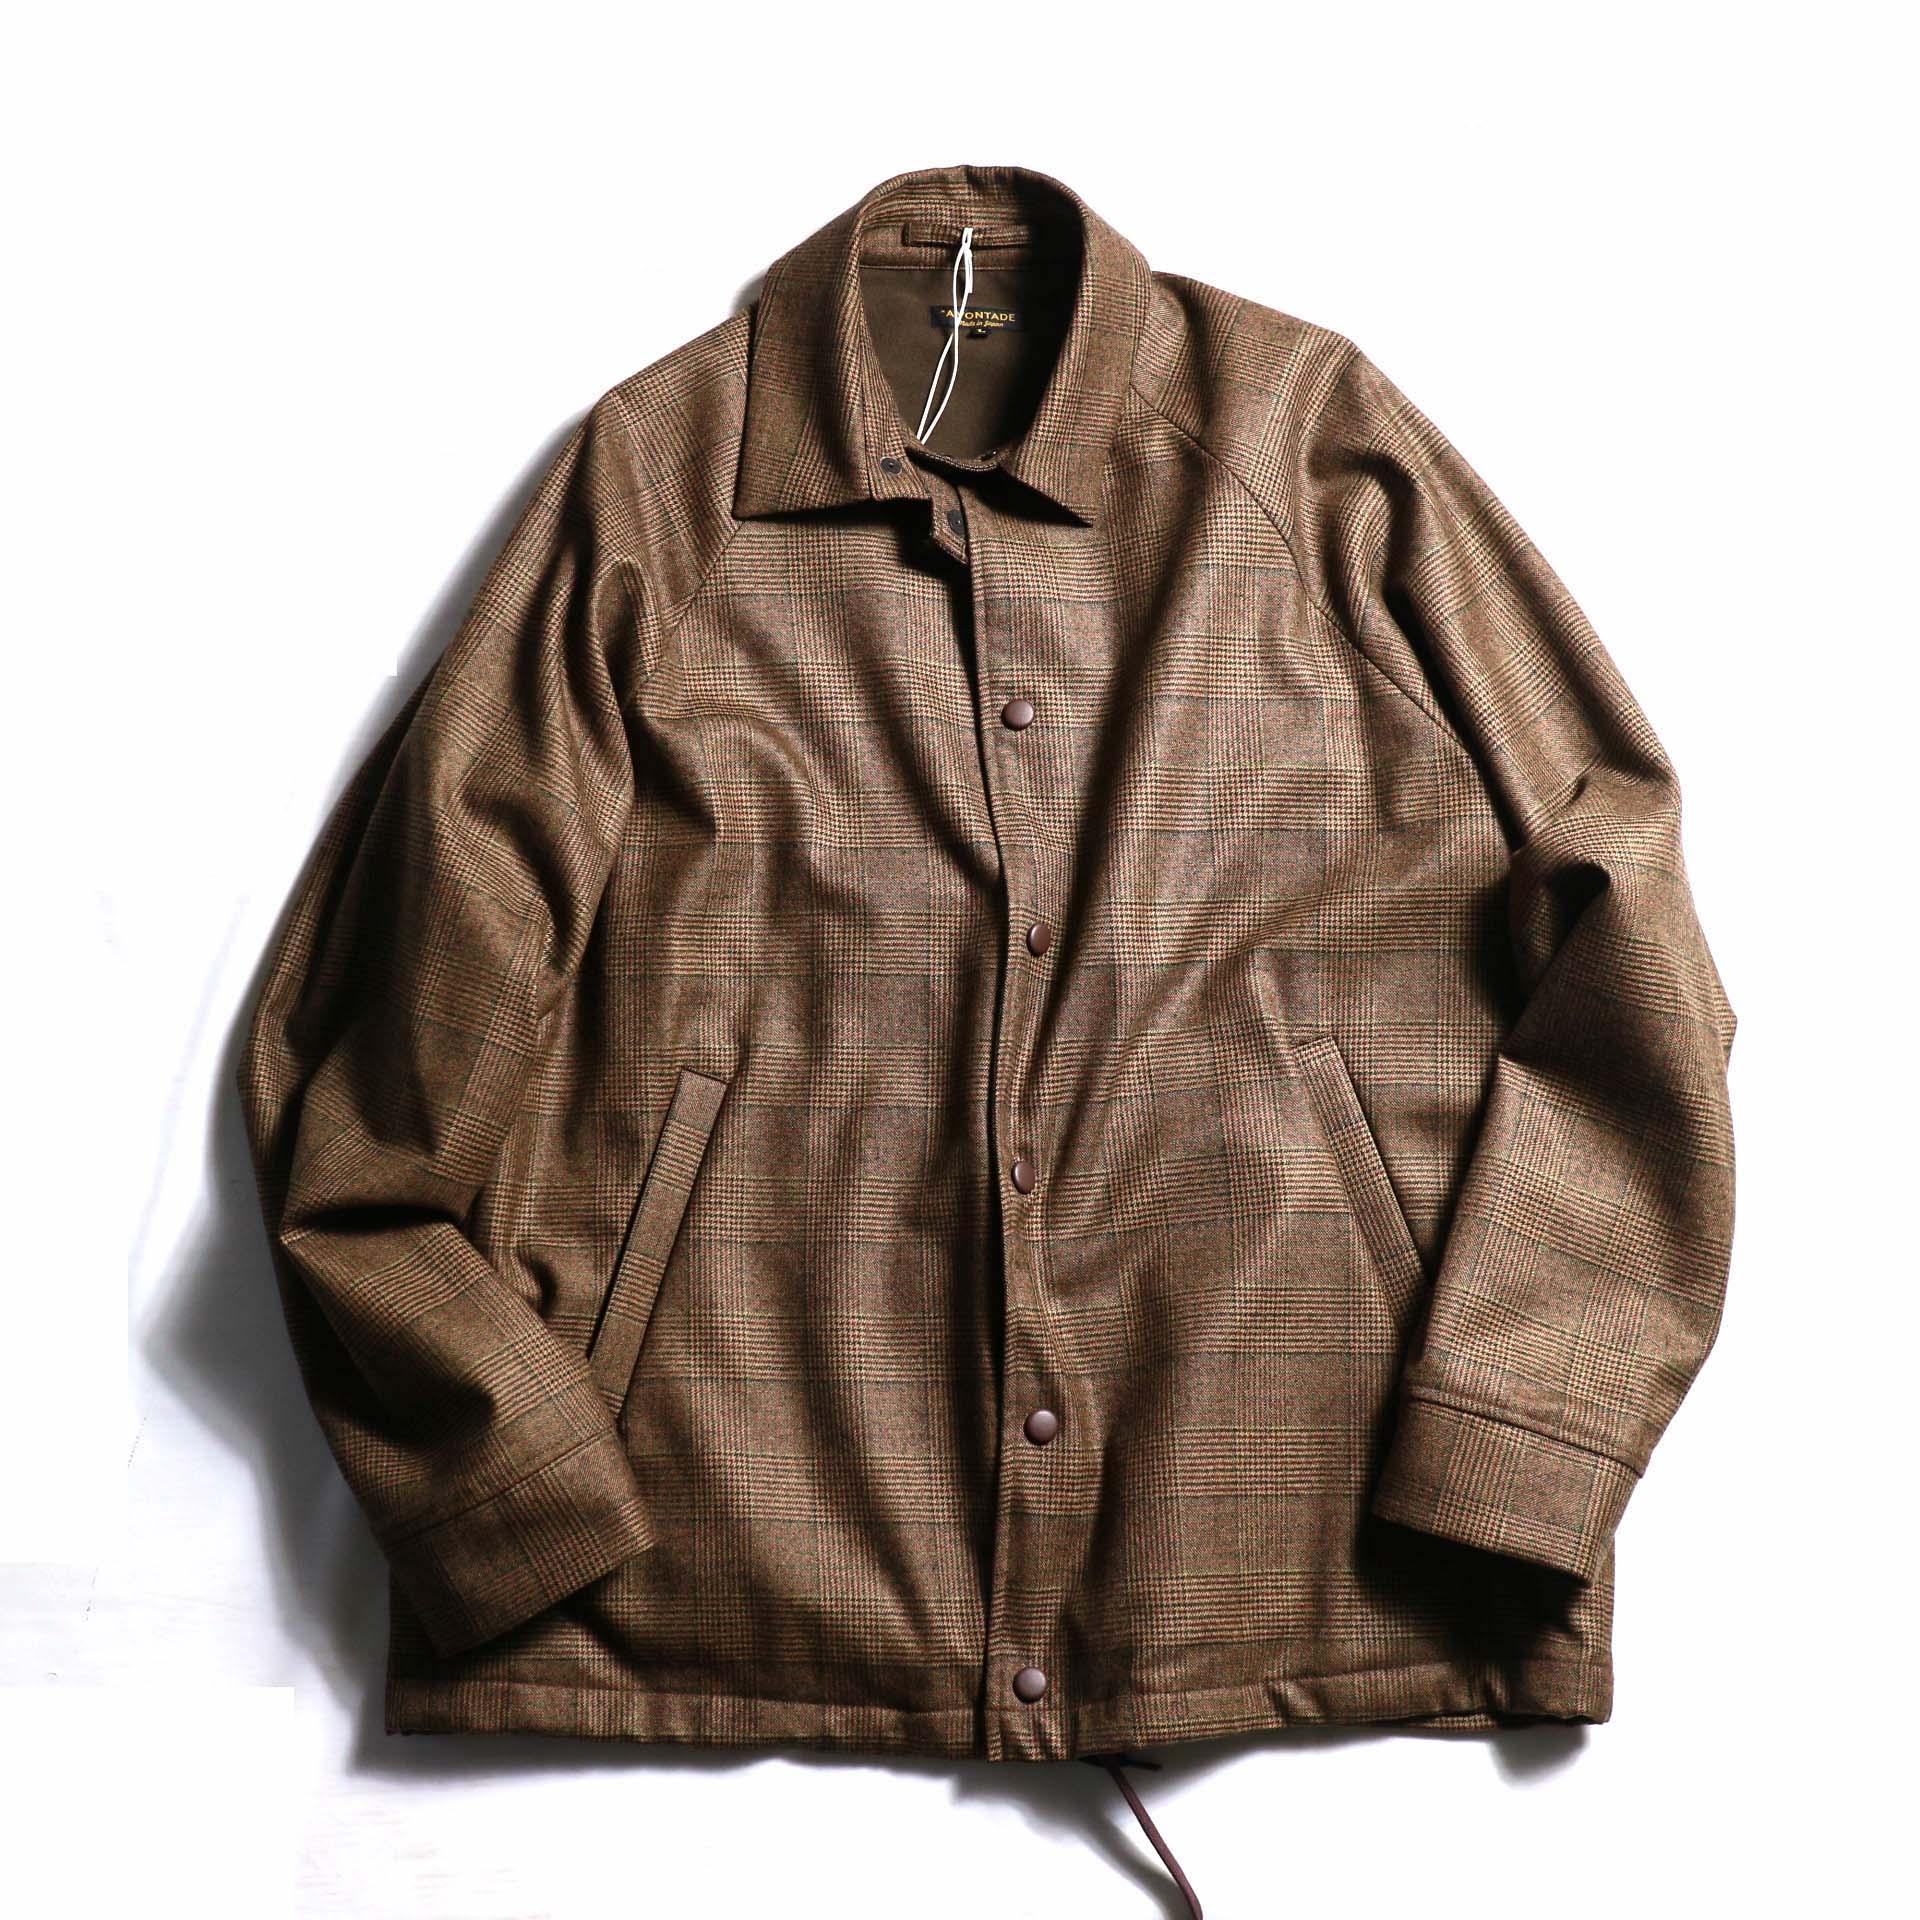 A VONTADE / Wool Coaches Jacket - BROWN GREN CHECK